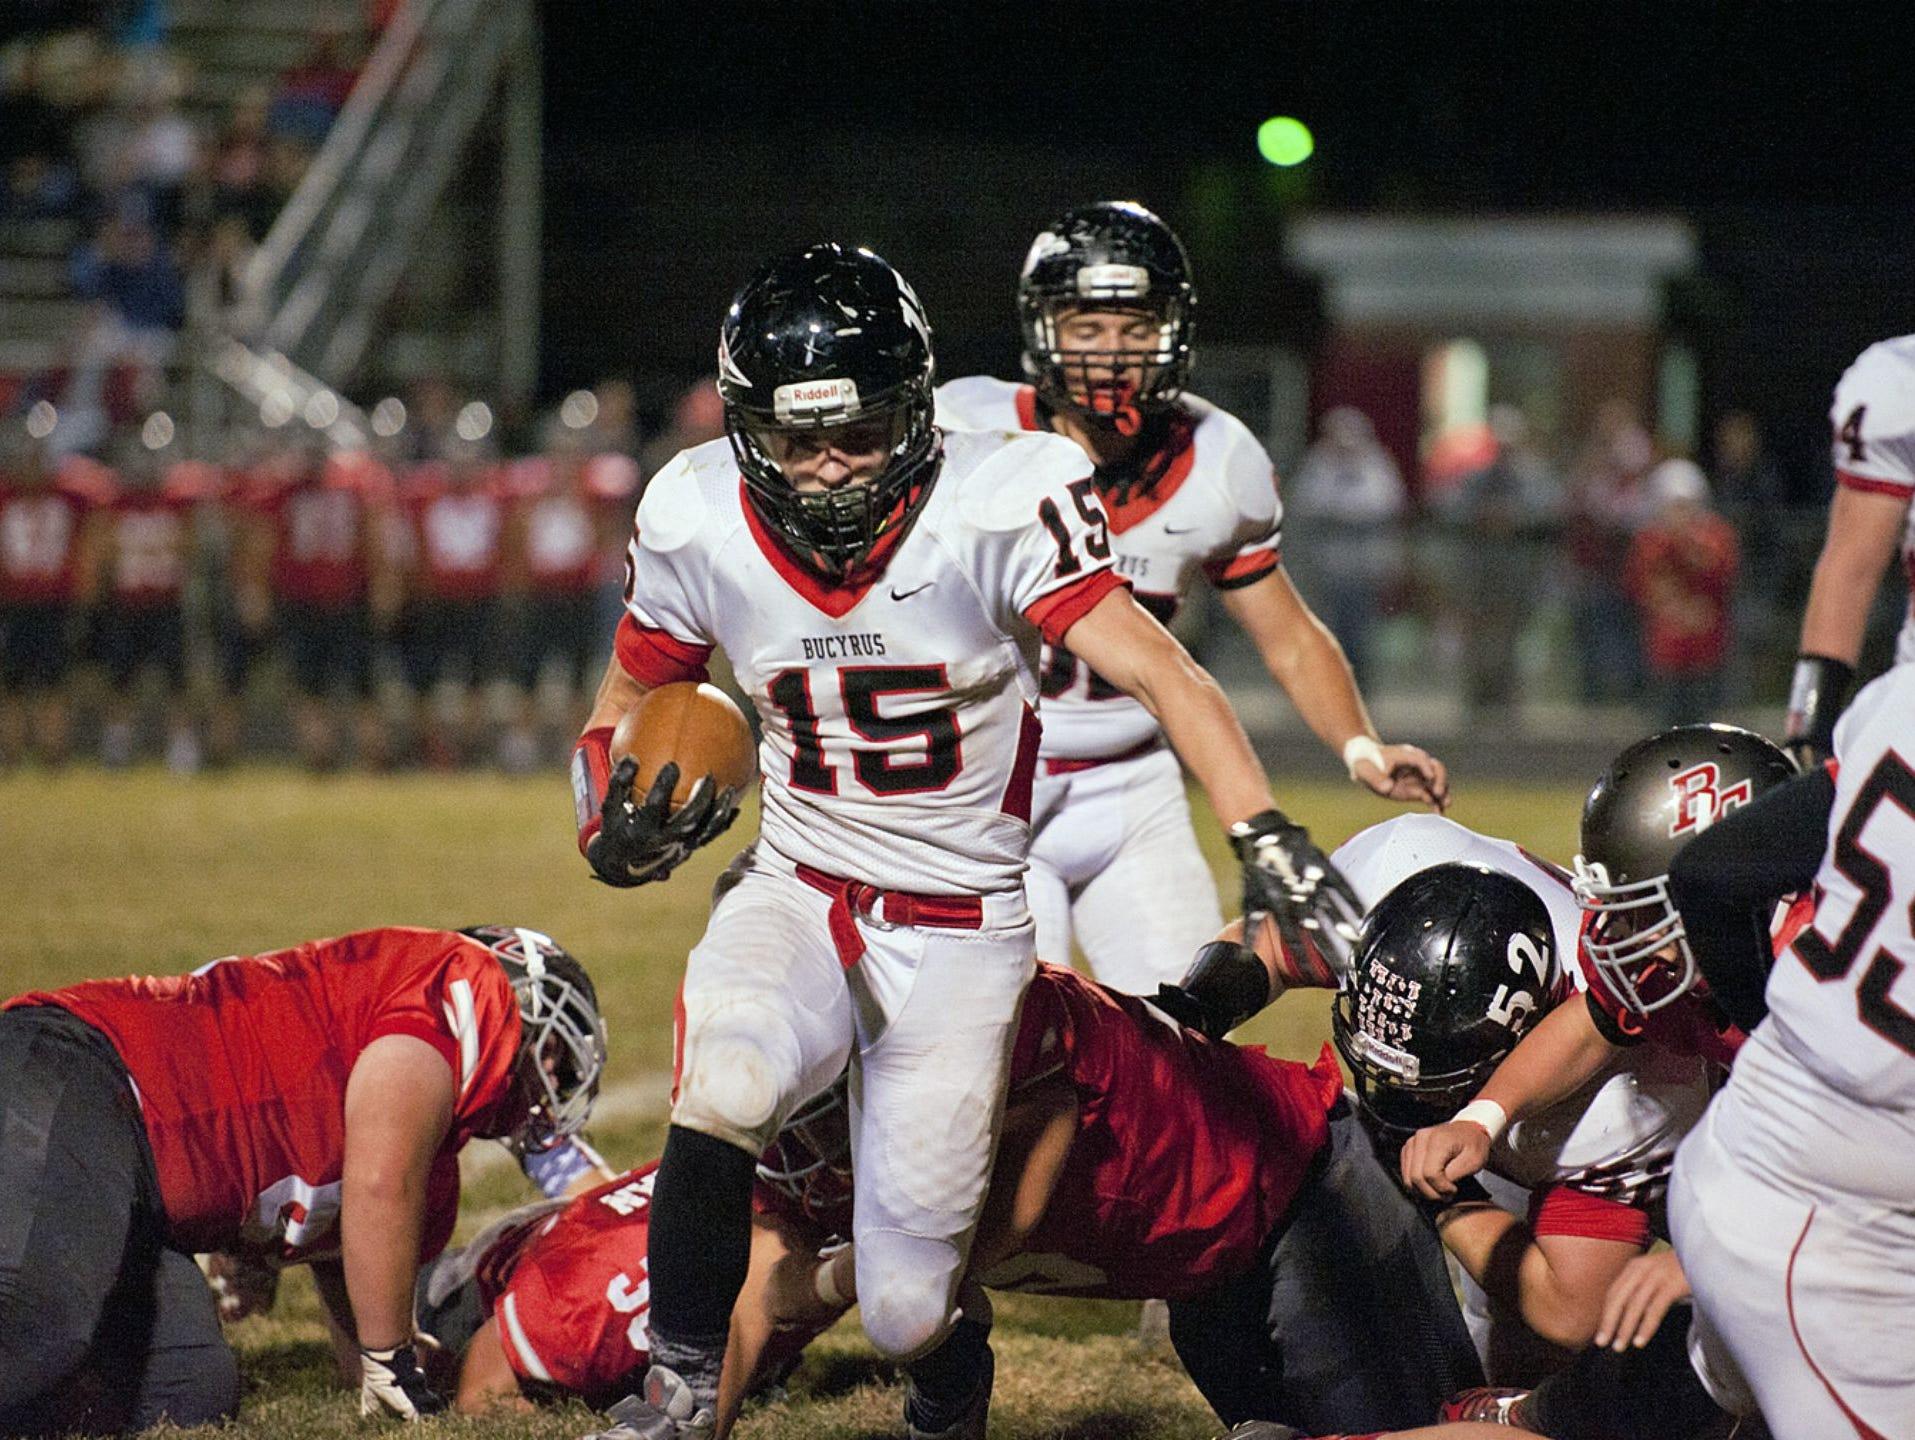 Bucyrus senior Logan Tackett carries the ball against Buckeye Central